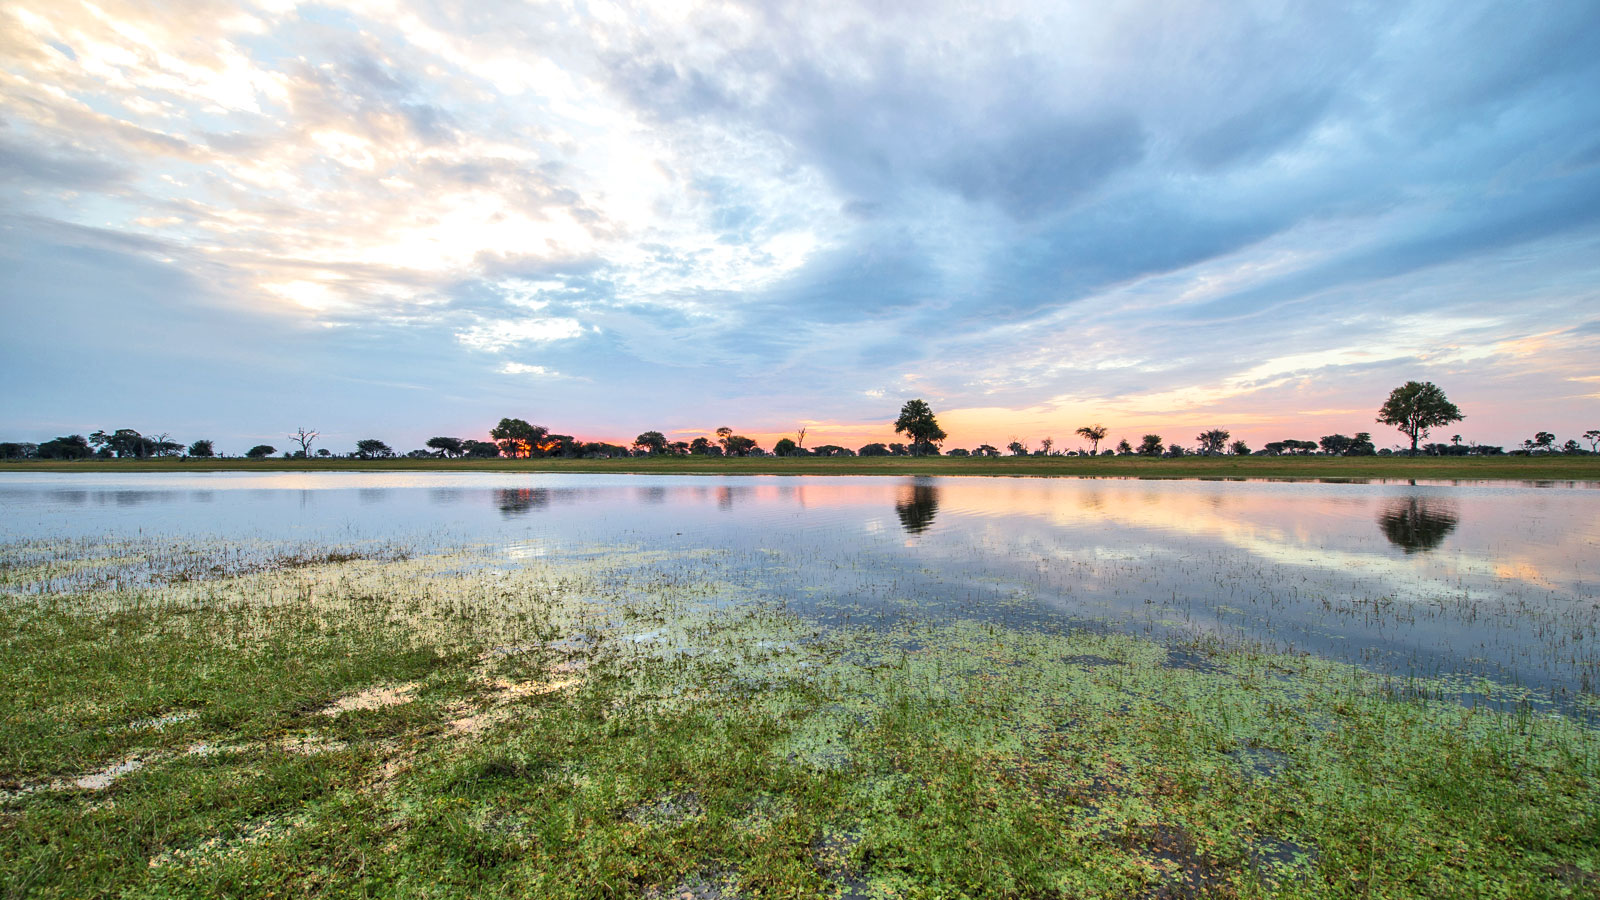 Safari Okavango Delta Botswana Erlebnisreise in Kleingruppe travelejunkies